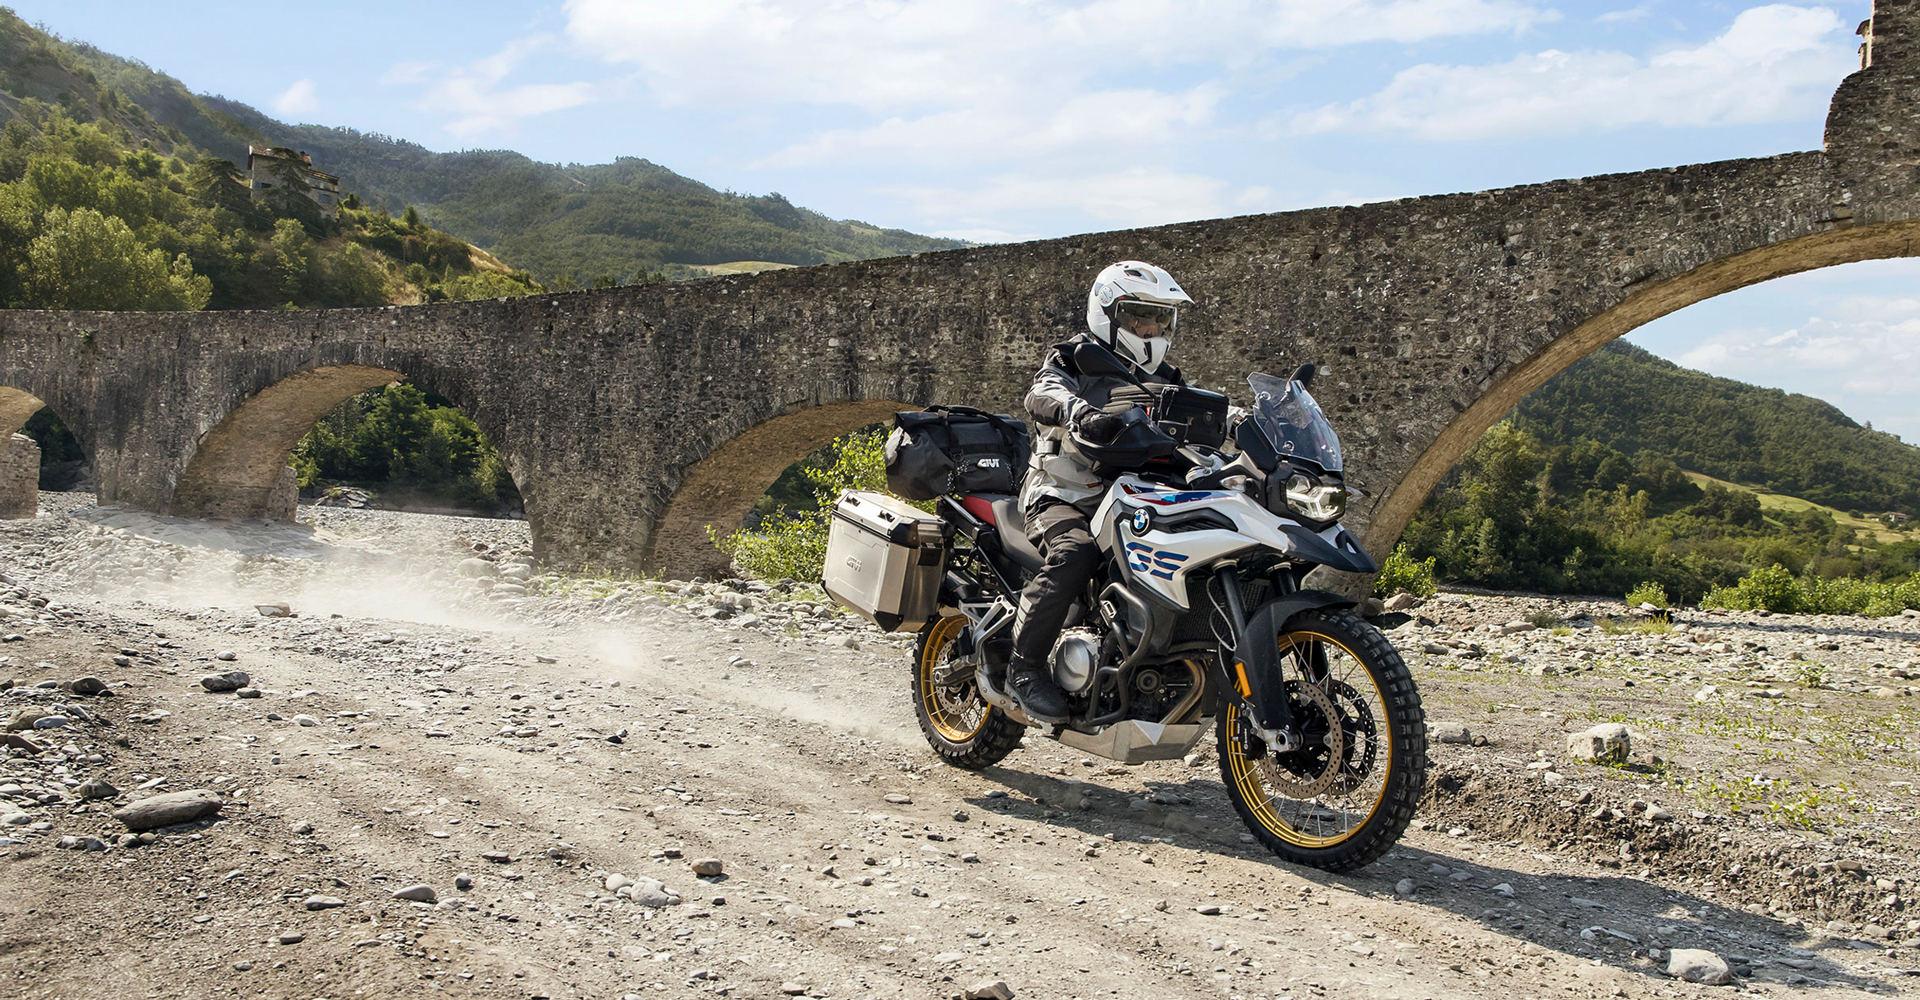 Test moto chargée